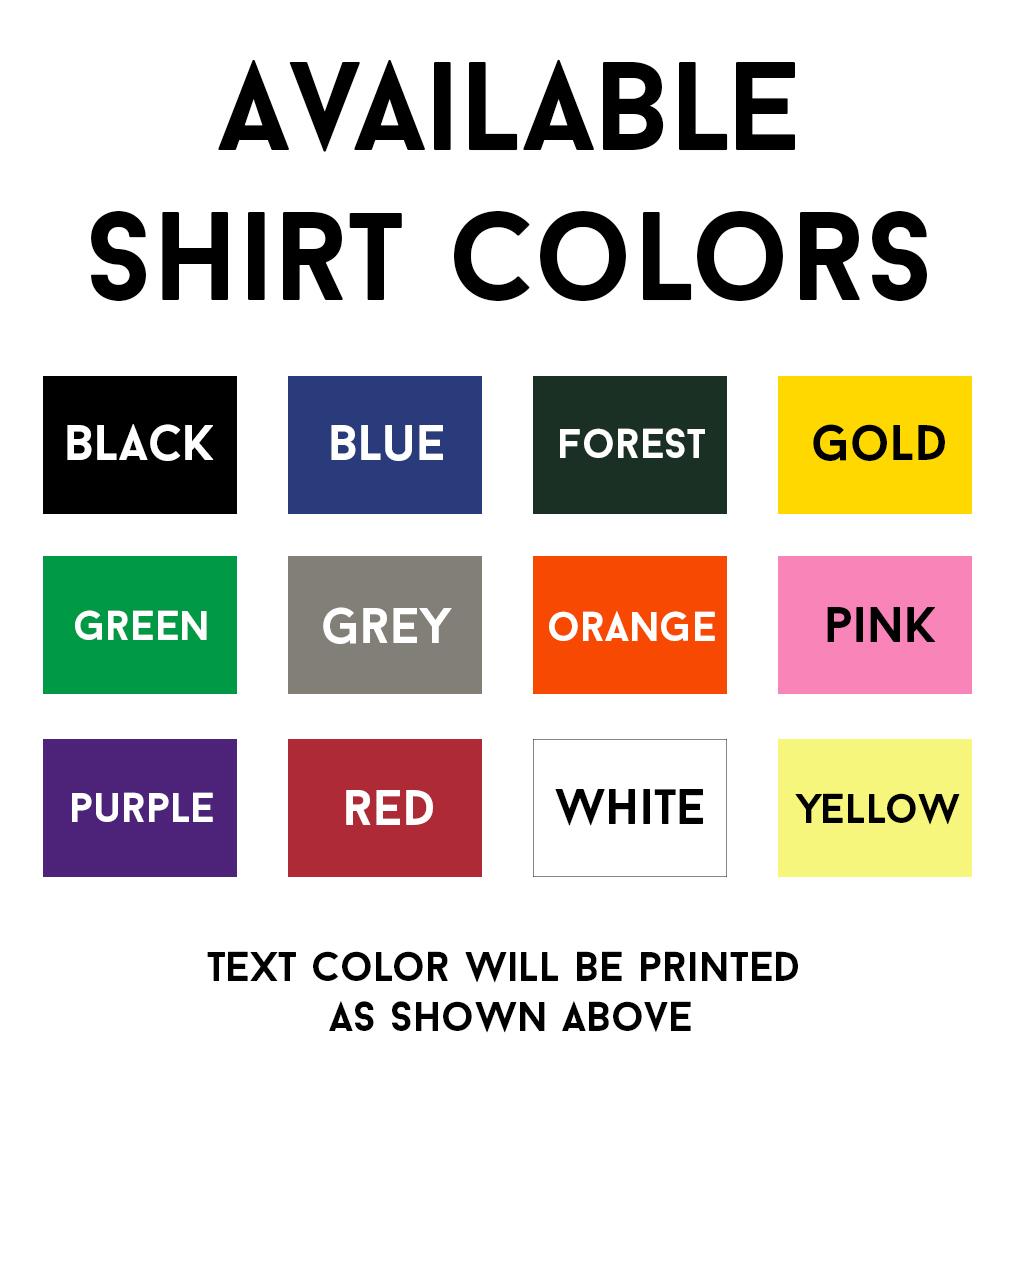 I'd Rather Be NOMINATING - Men's Adult Short Sleeve T-Shirt